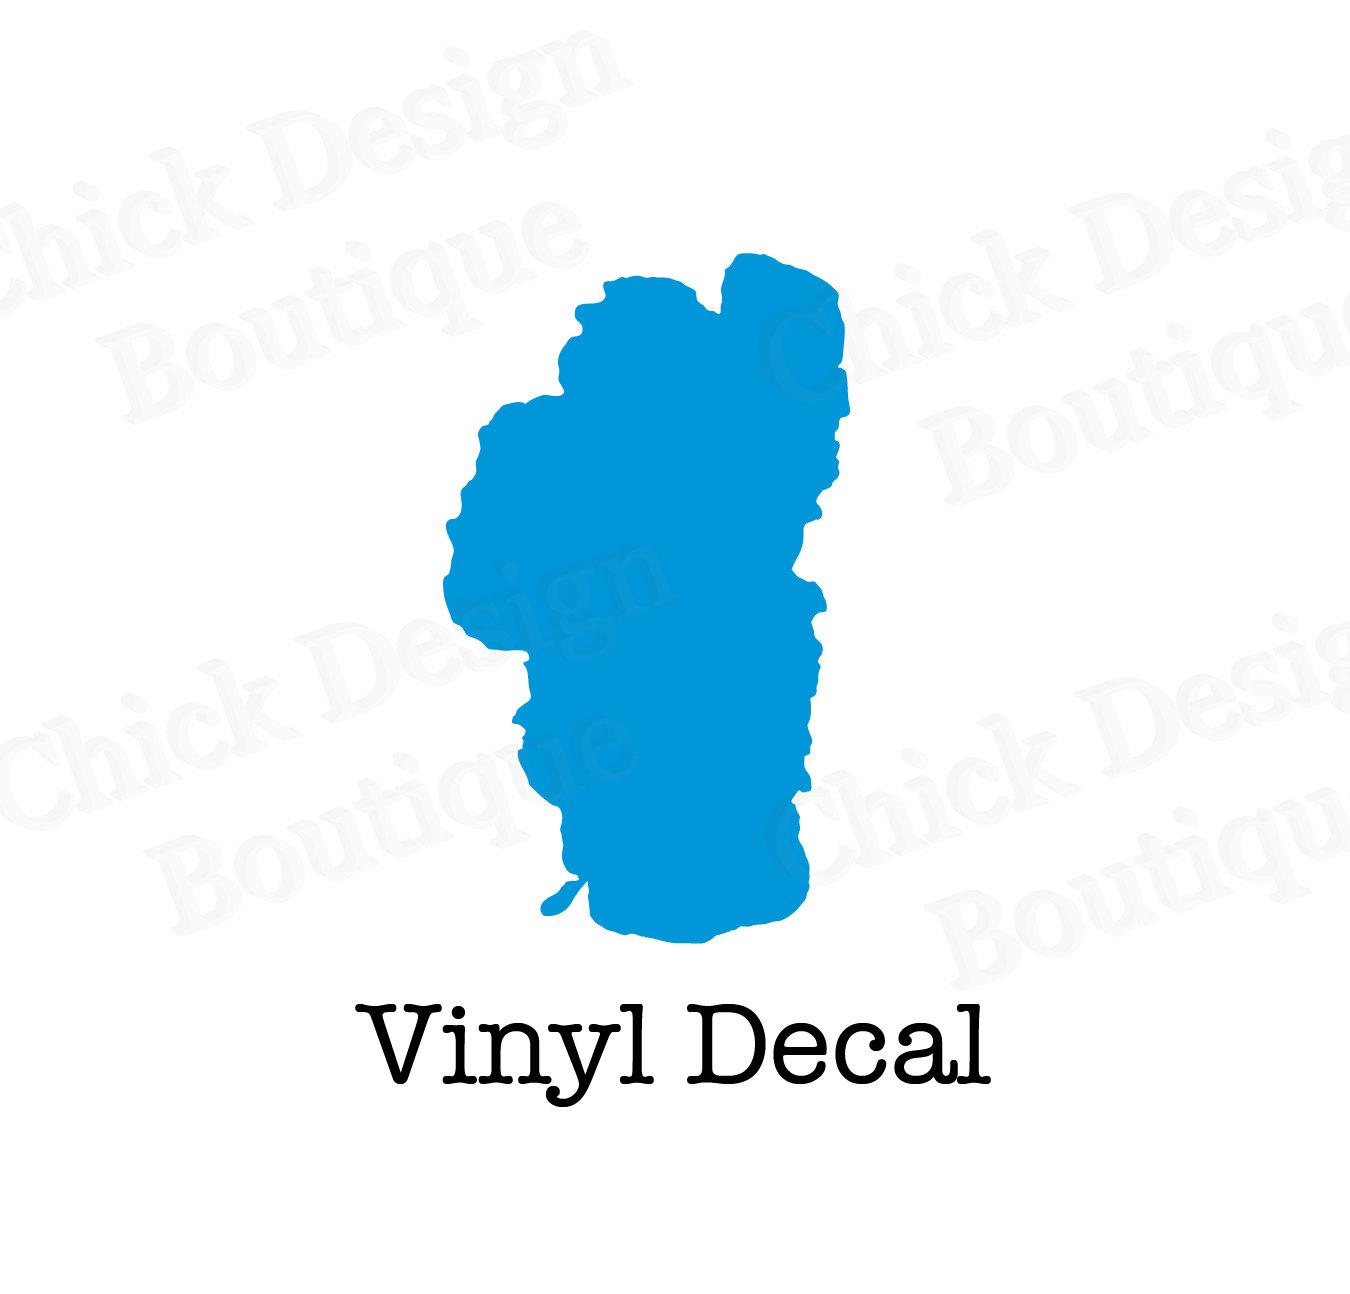 Lake Tahoe clipart Vinyl Lake Decal lake South